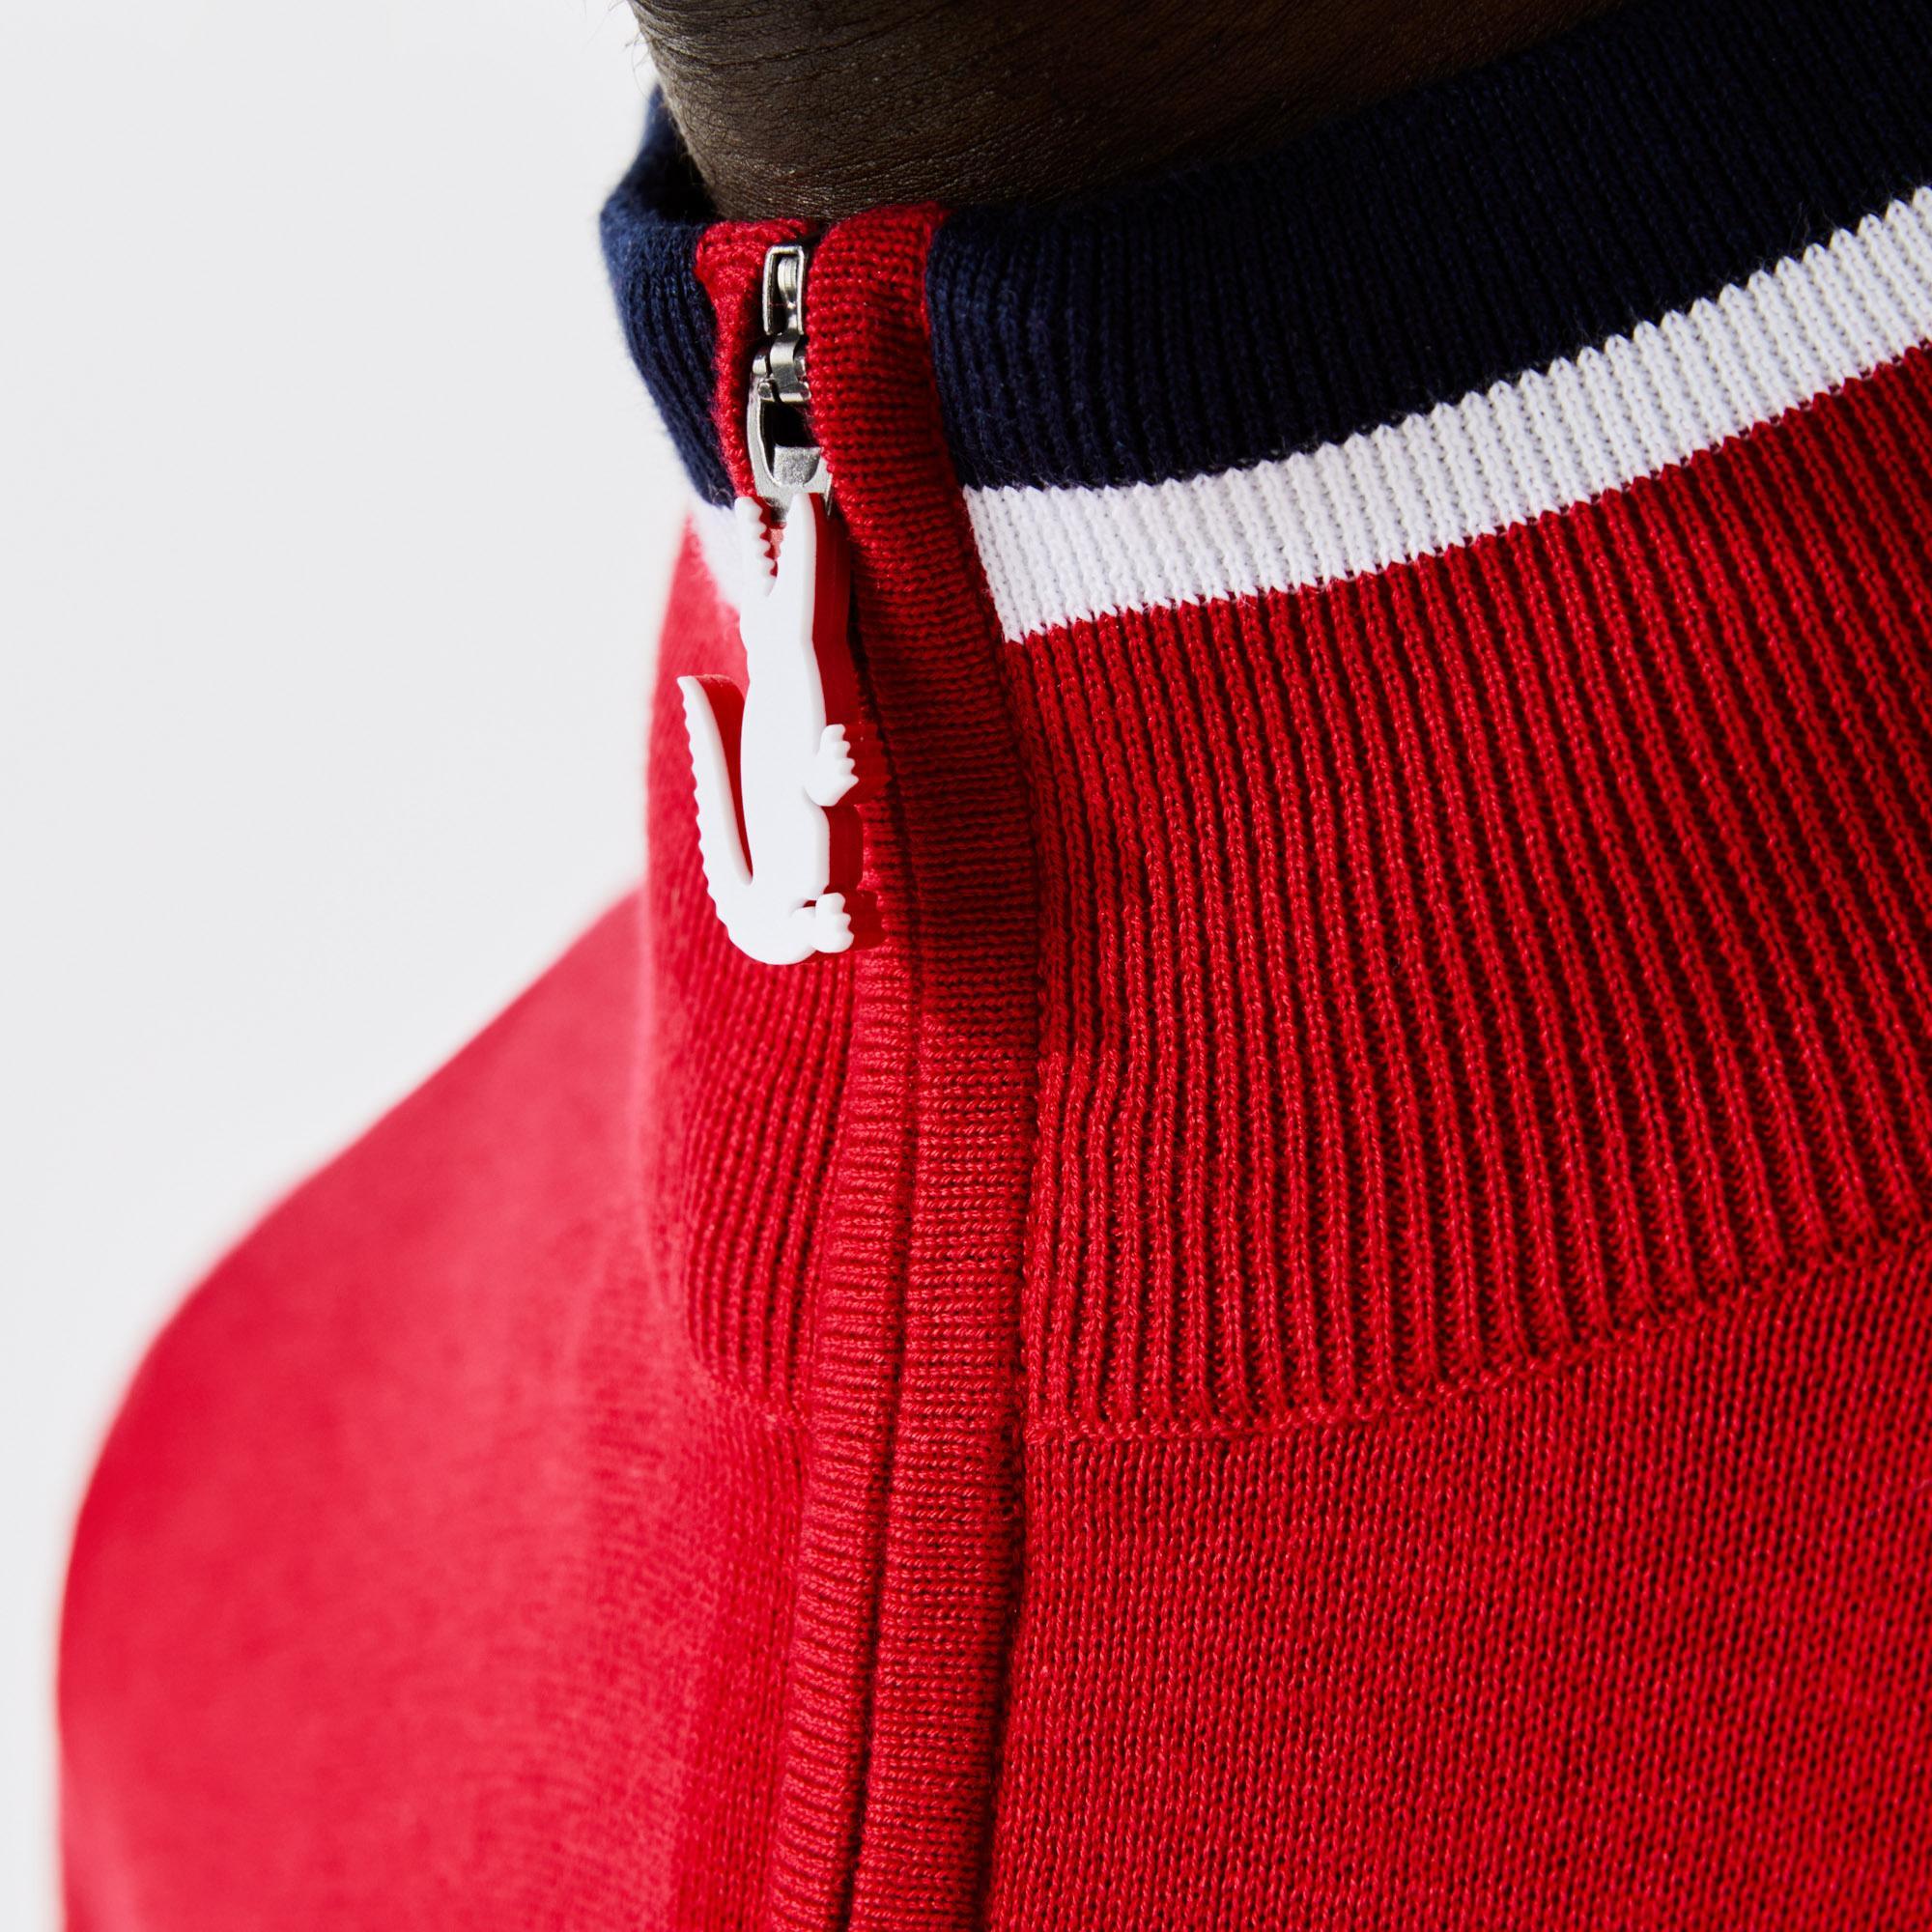 Lacoste SPORT Men's Trucker Neck Bicolour Knit Golf Sweater